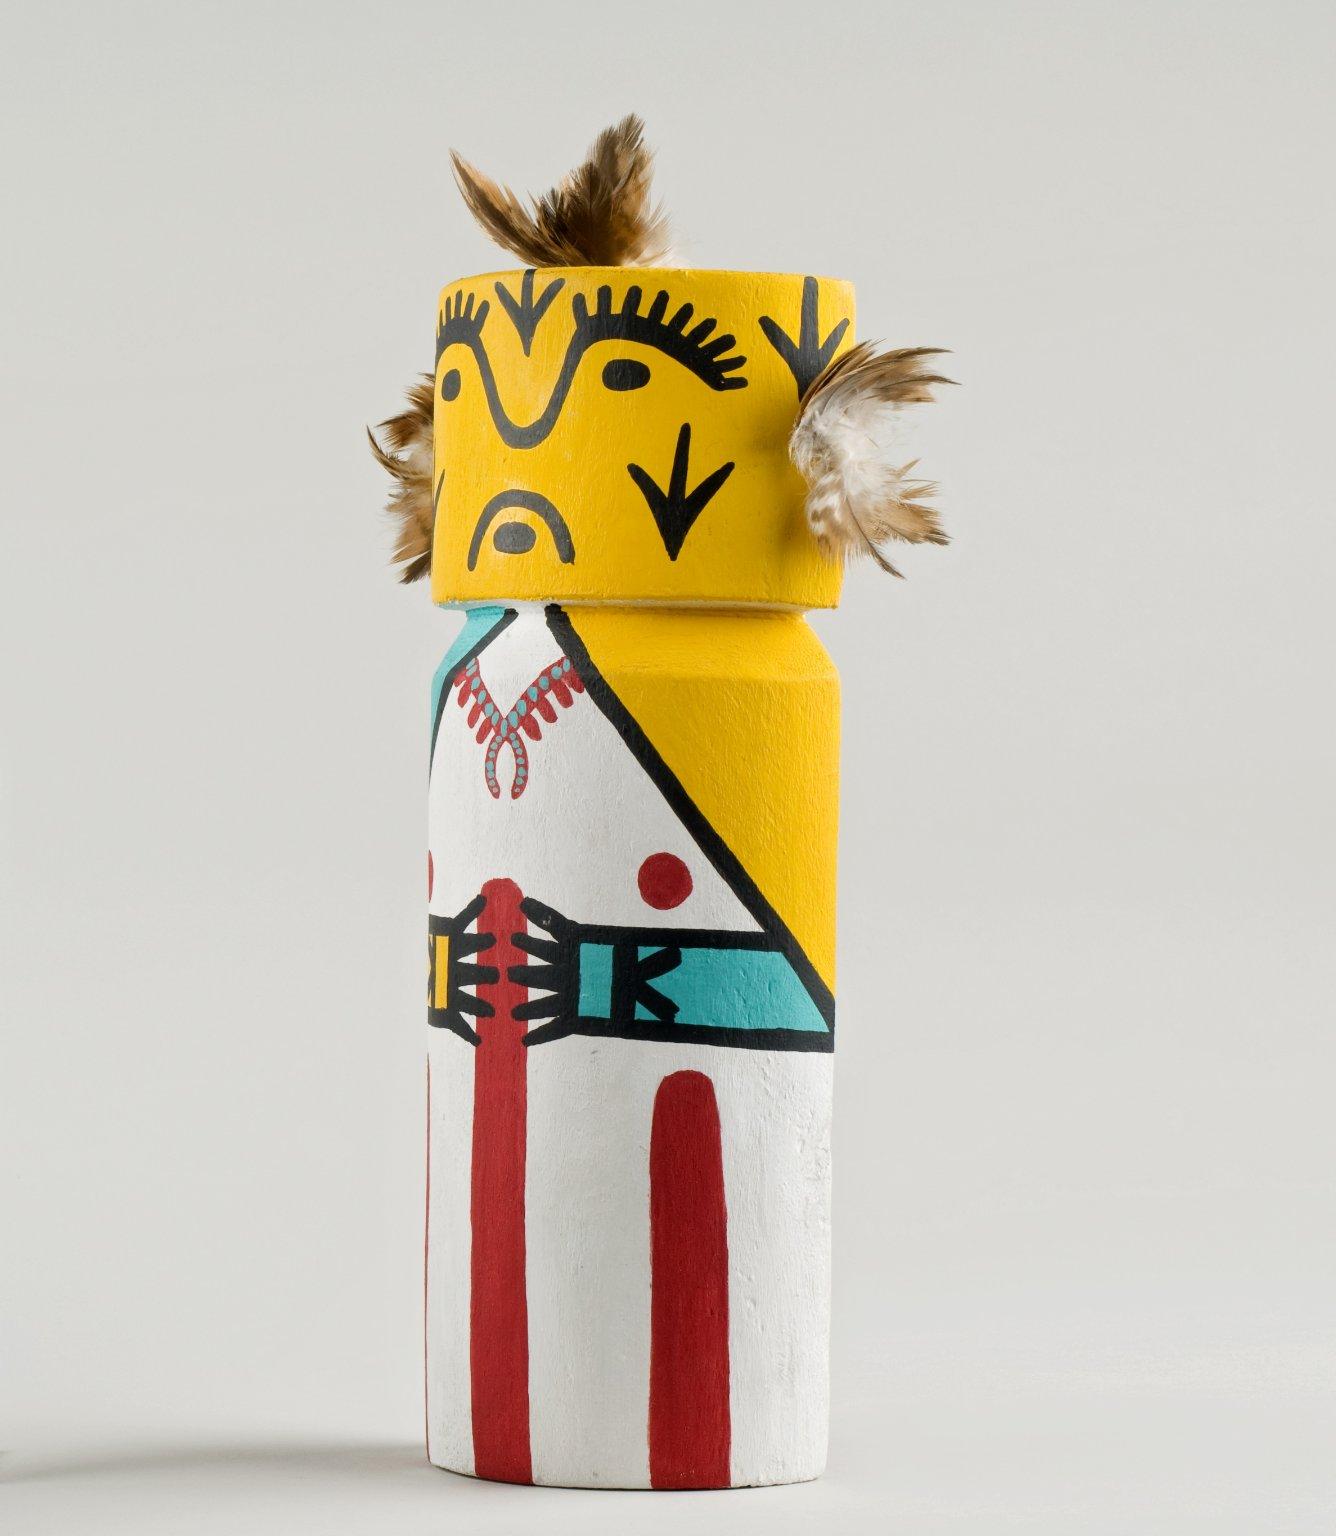 Qoqlo Kachina Doll